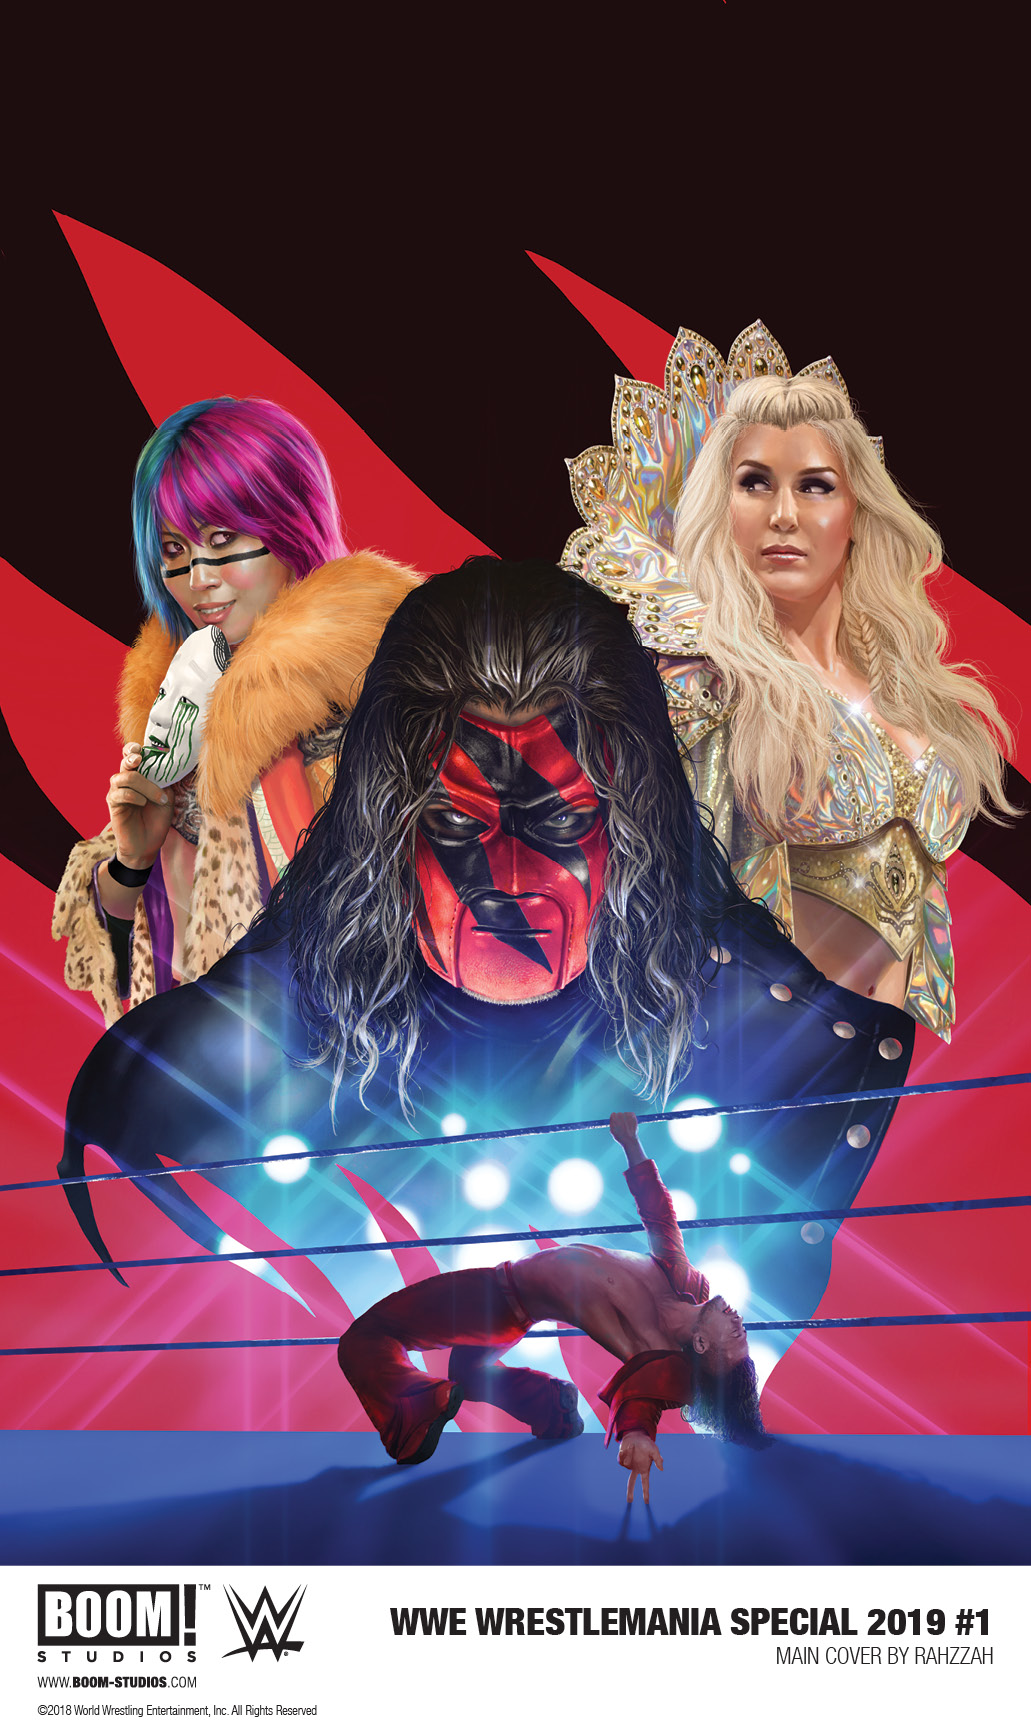 Wrestlemania 2019 Special  #1